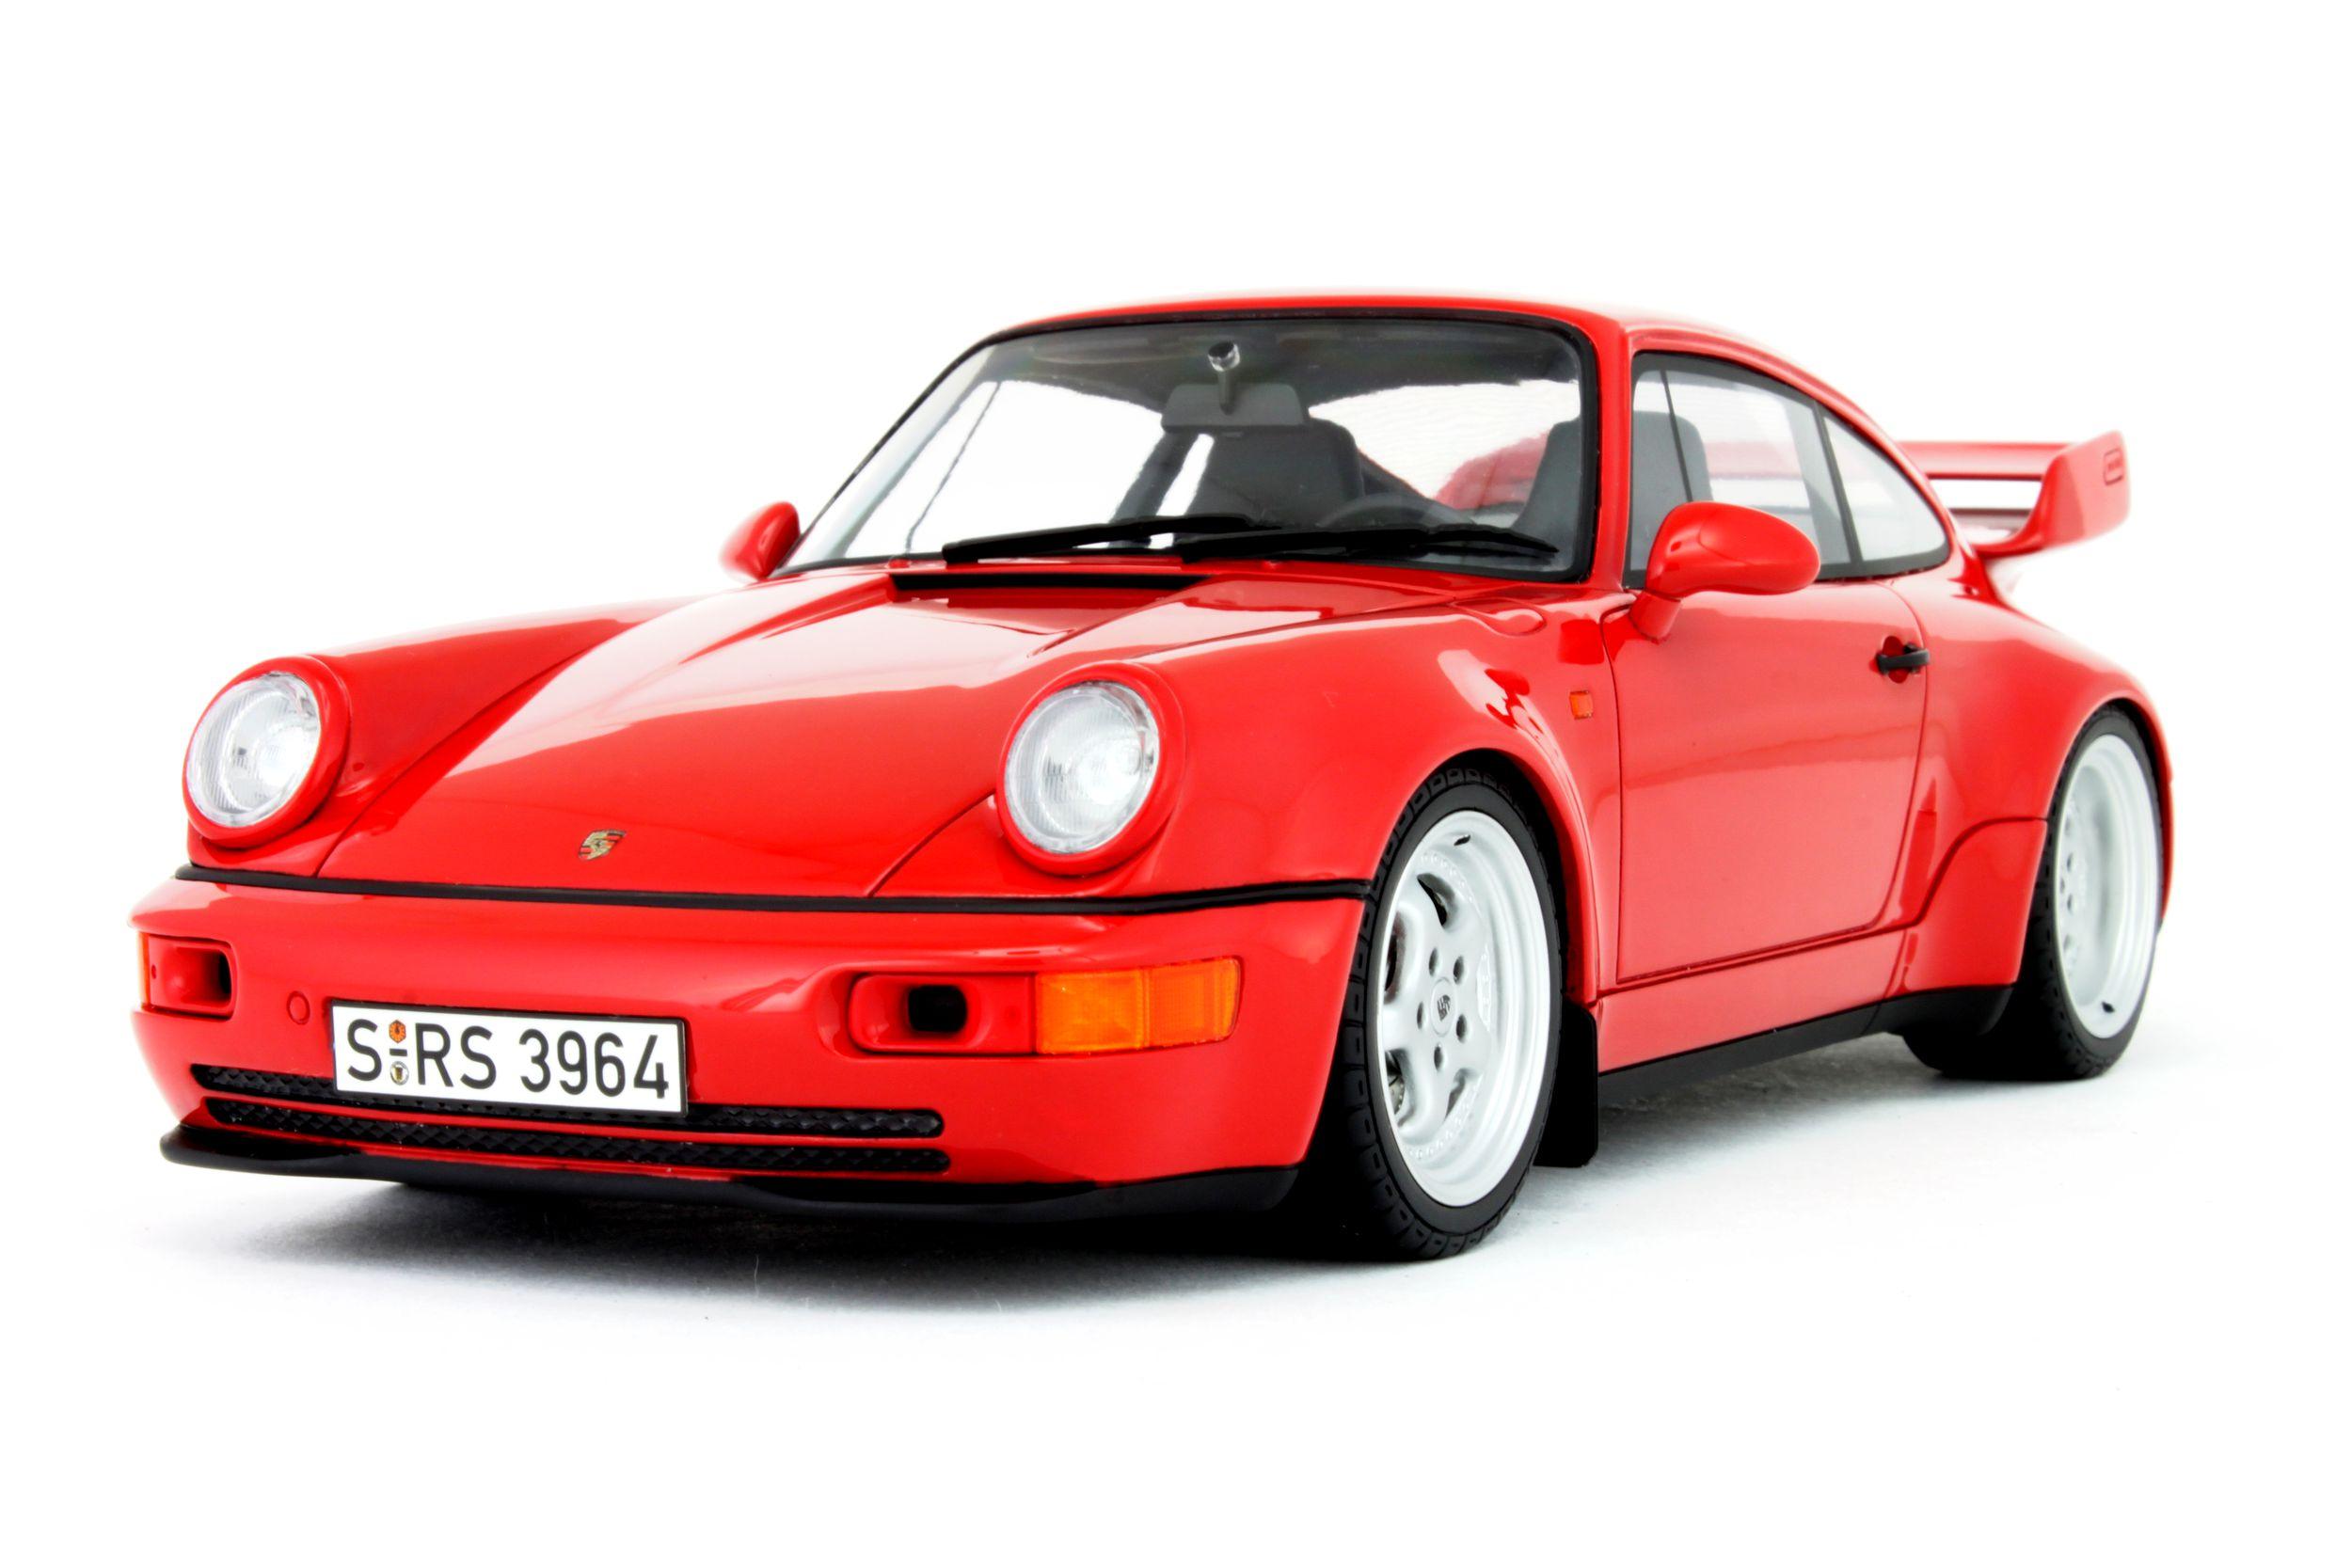 Porsche 911 (964) Carrera RS 3.8